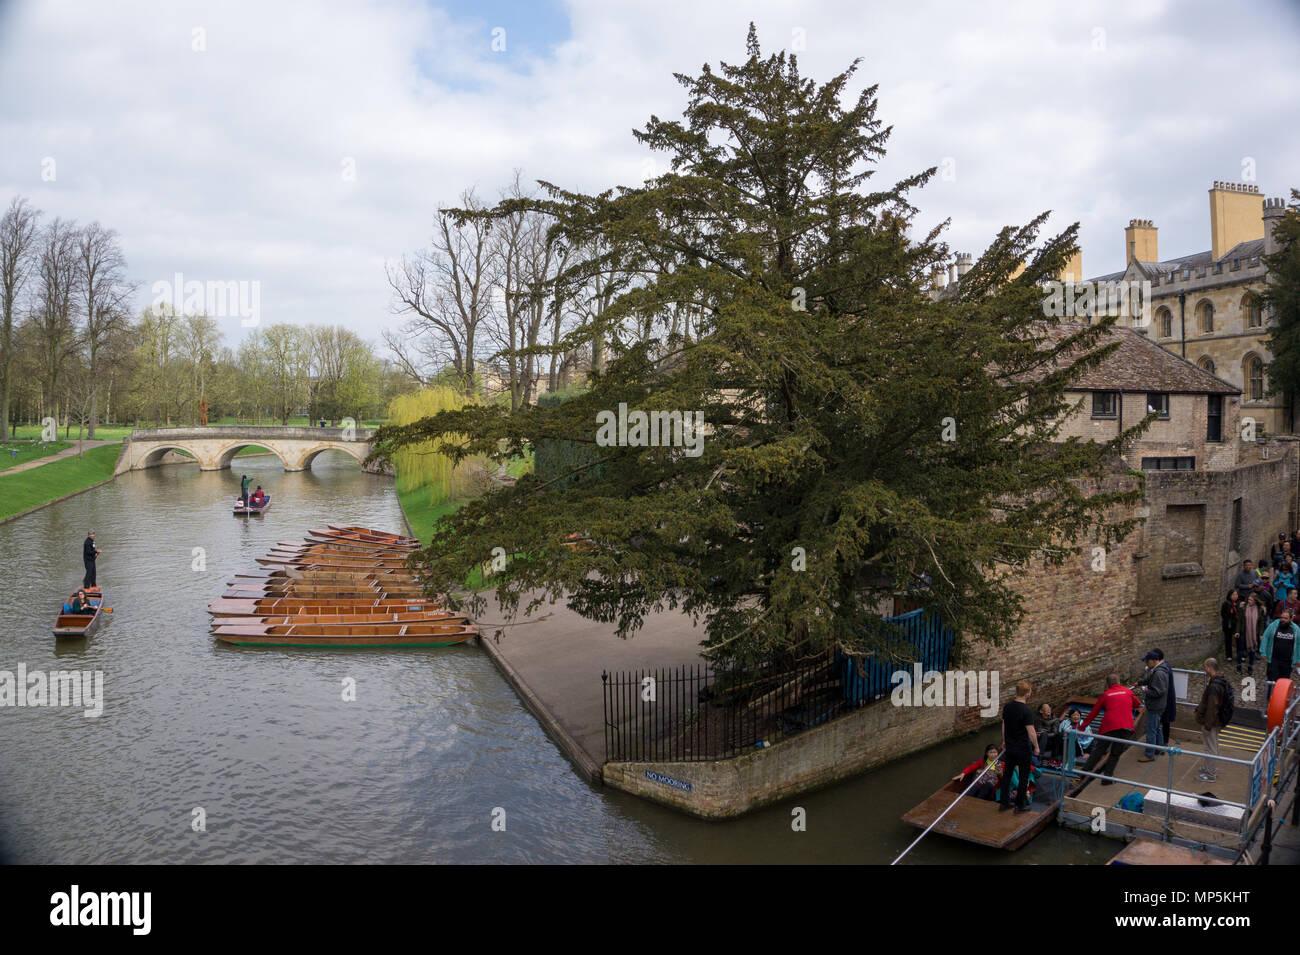 Punting tour in Cam River, Cambridge United Kingdom - Stock Image